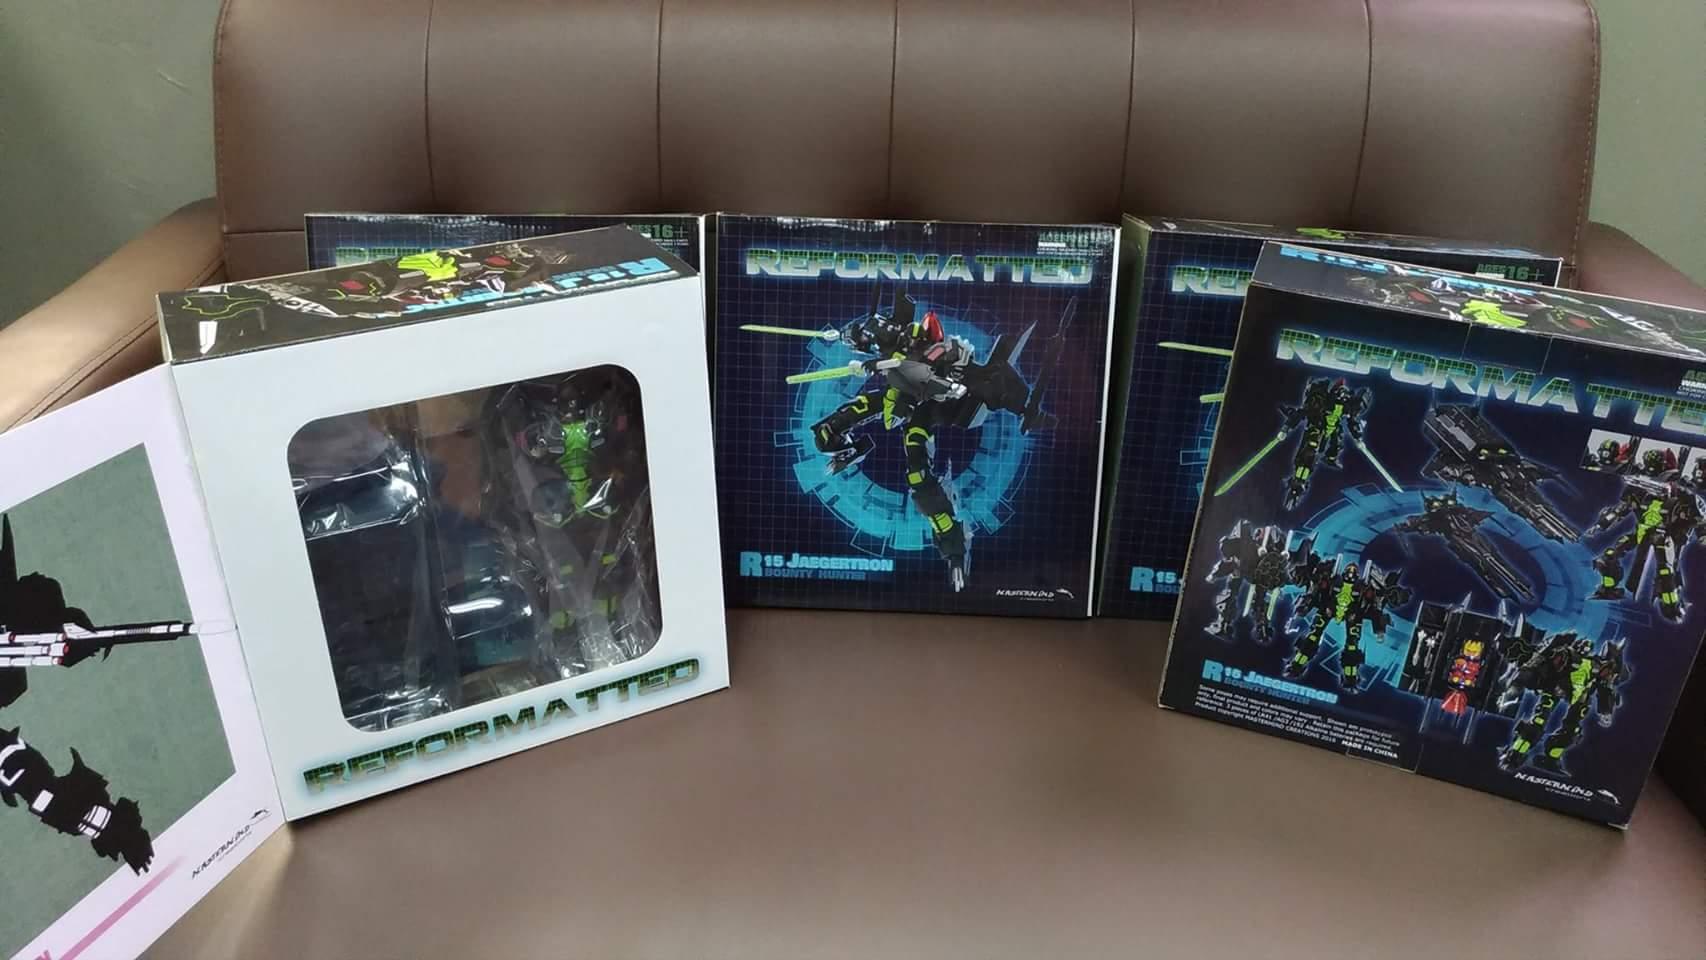 [Mastermind Creations] Produit Tiers - R-15 Jaegertron - aka Lockdown des BD IDW - Page 2 UNyj5arC